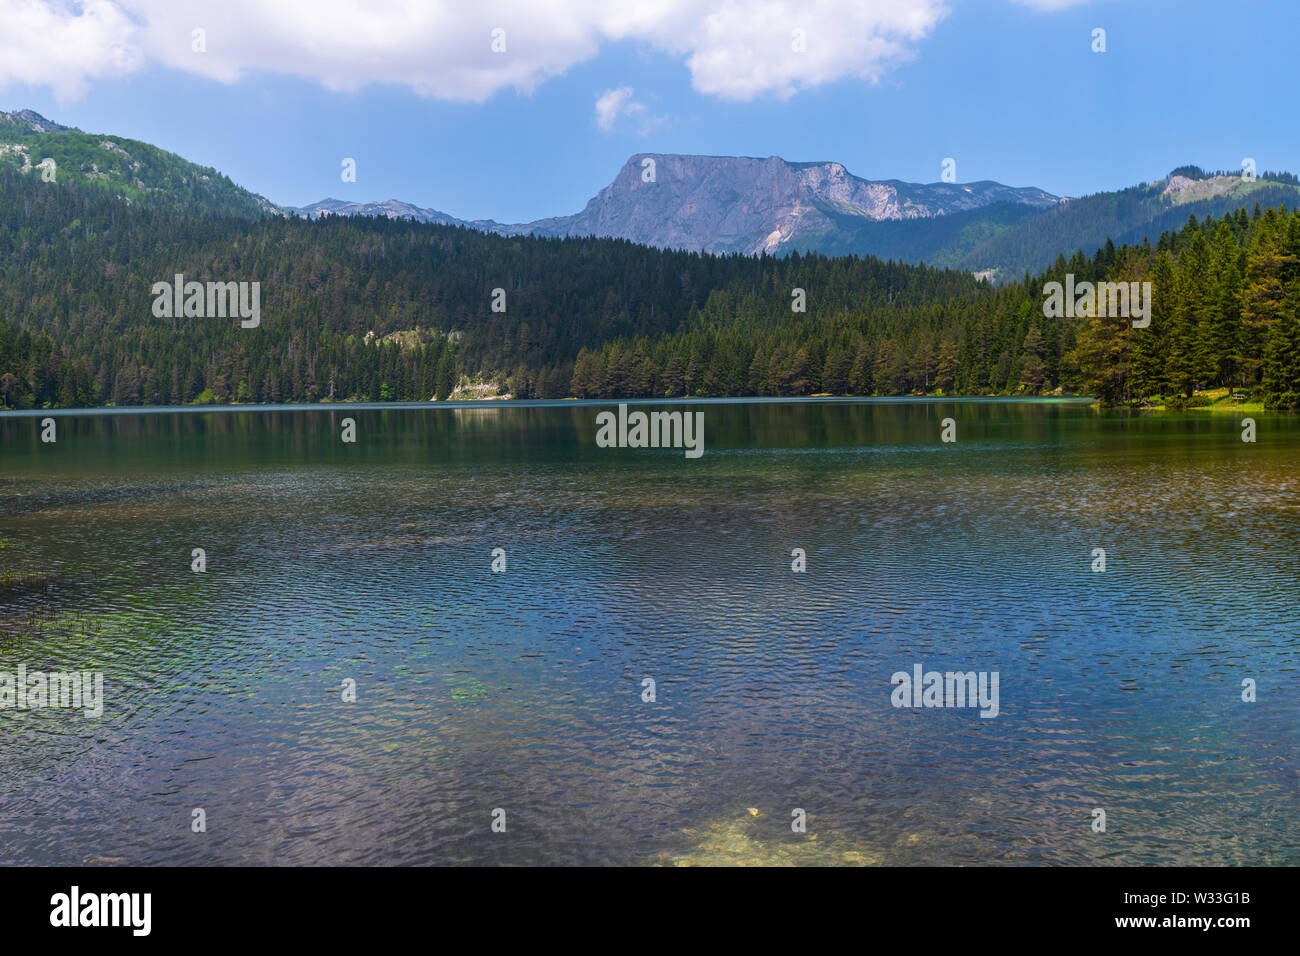 Montenegro, Black Lake in a Durmitor Park - Stock Image